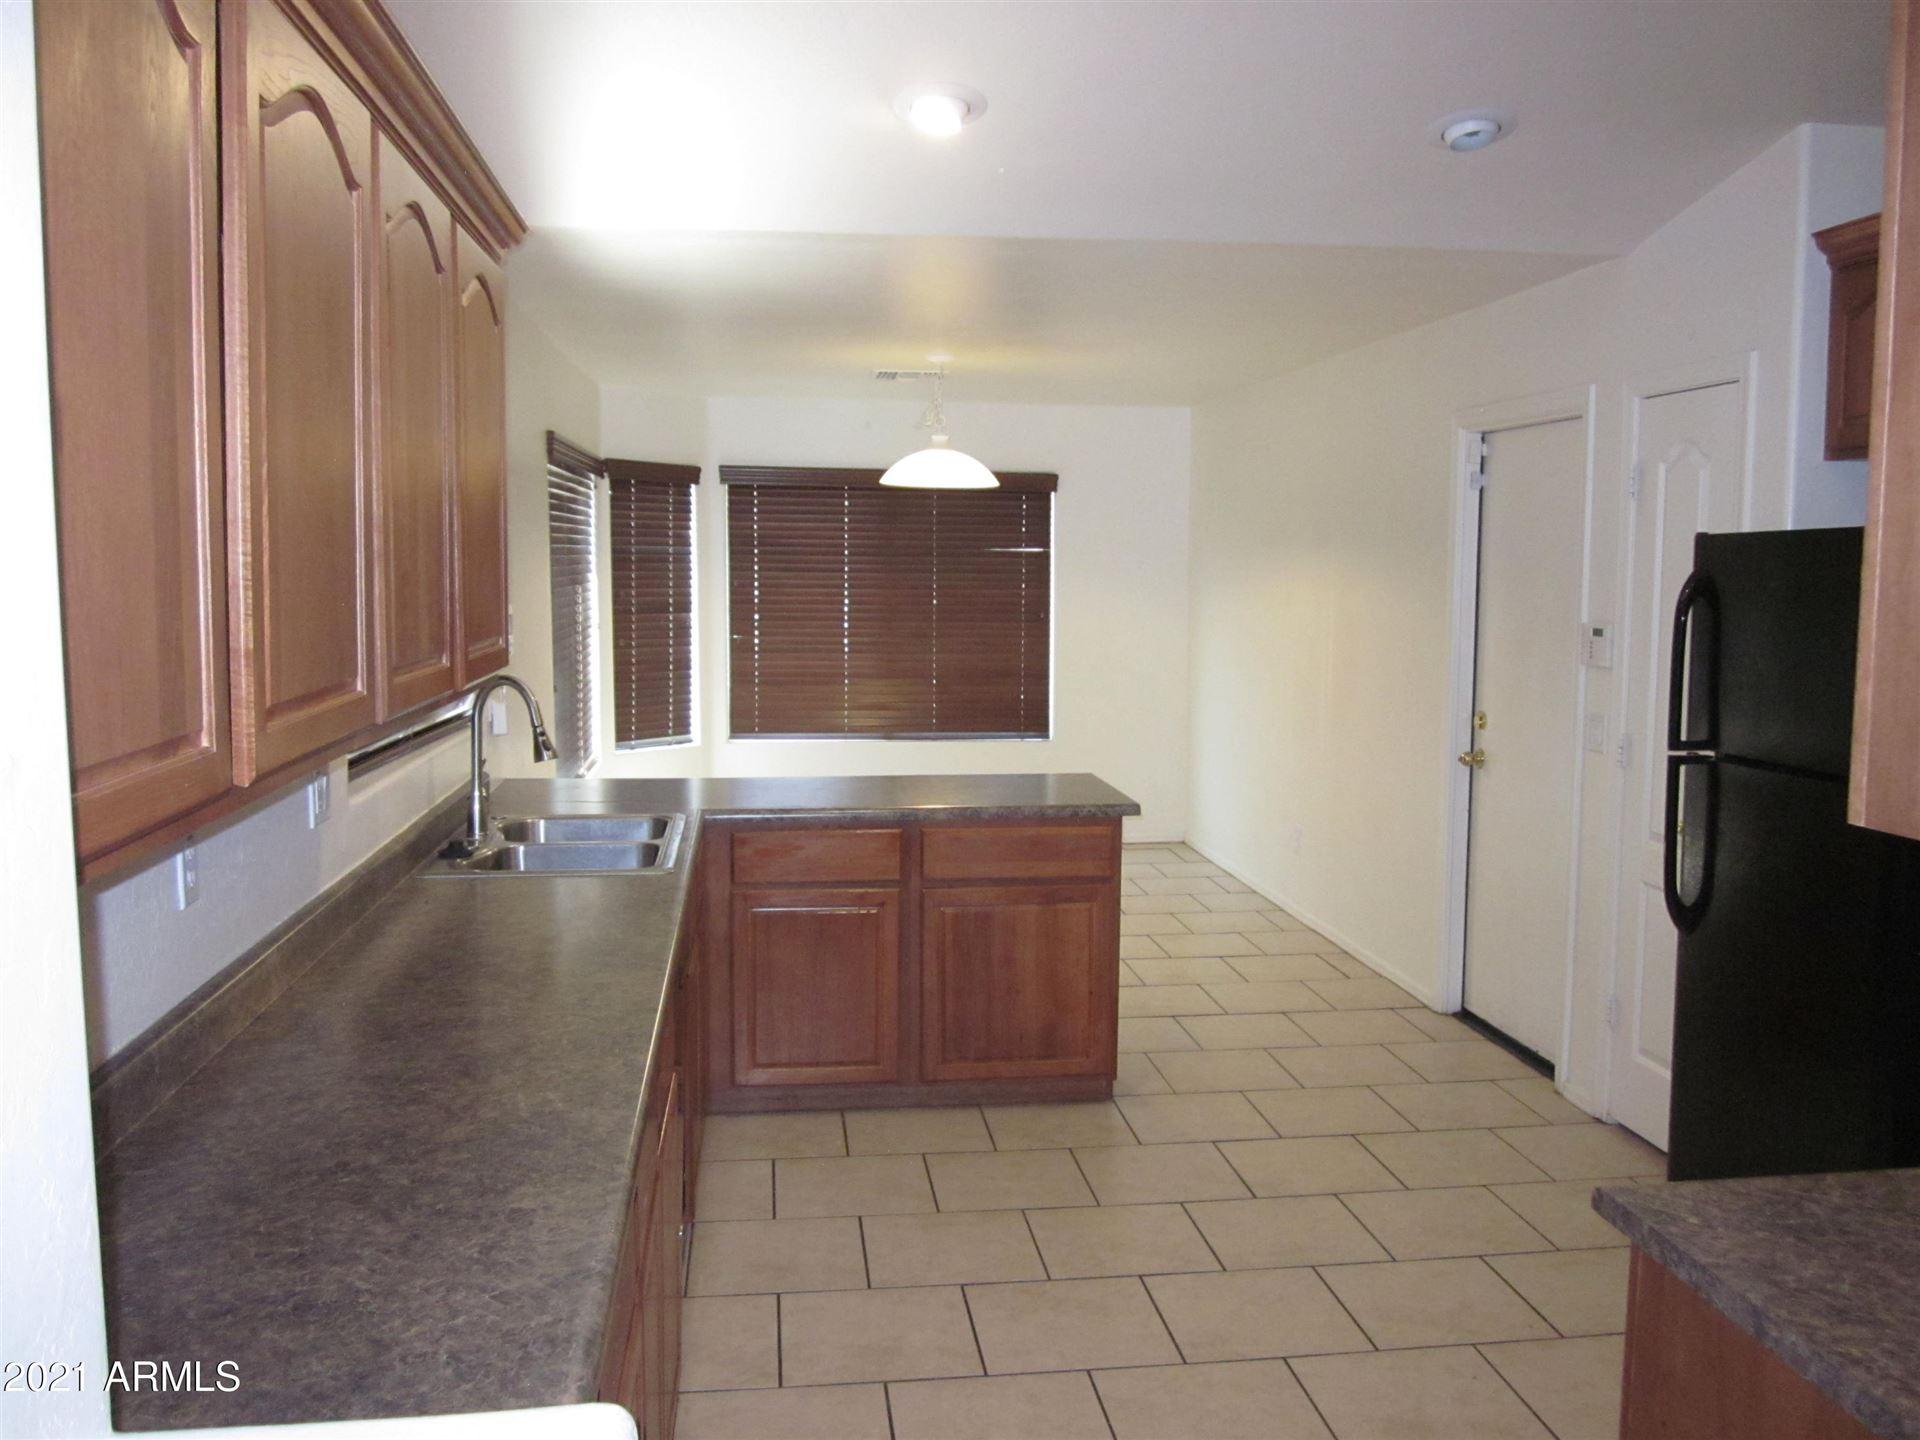 Photo of 10141 W VELIANA Way, Tolleson, AZ 85353 (MLS # 6268672)